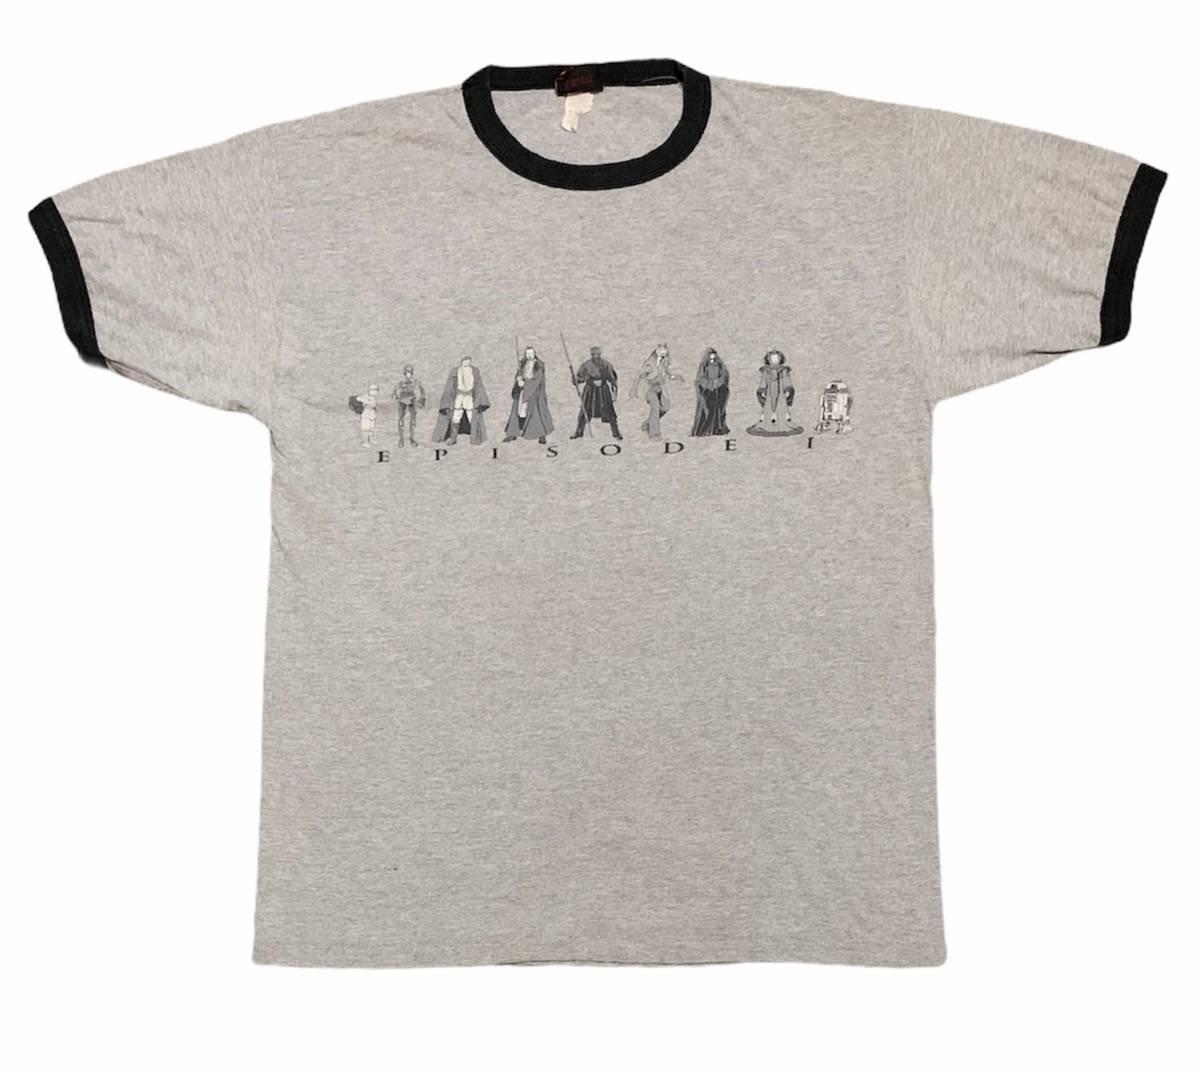 Vintage raree 1990 starwars character all overprint movie shirt